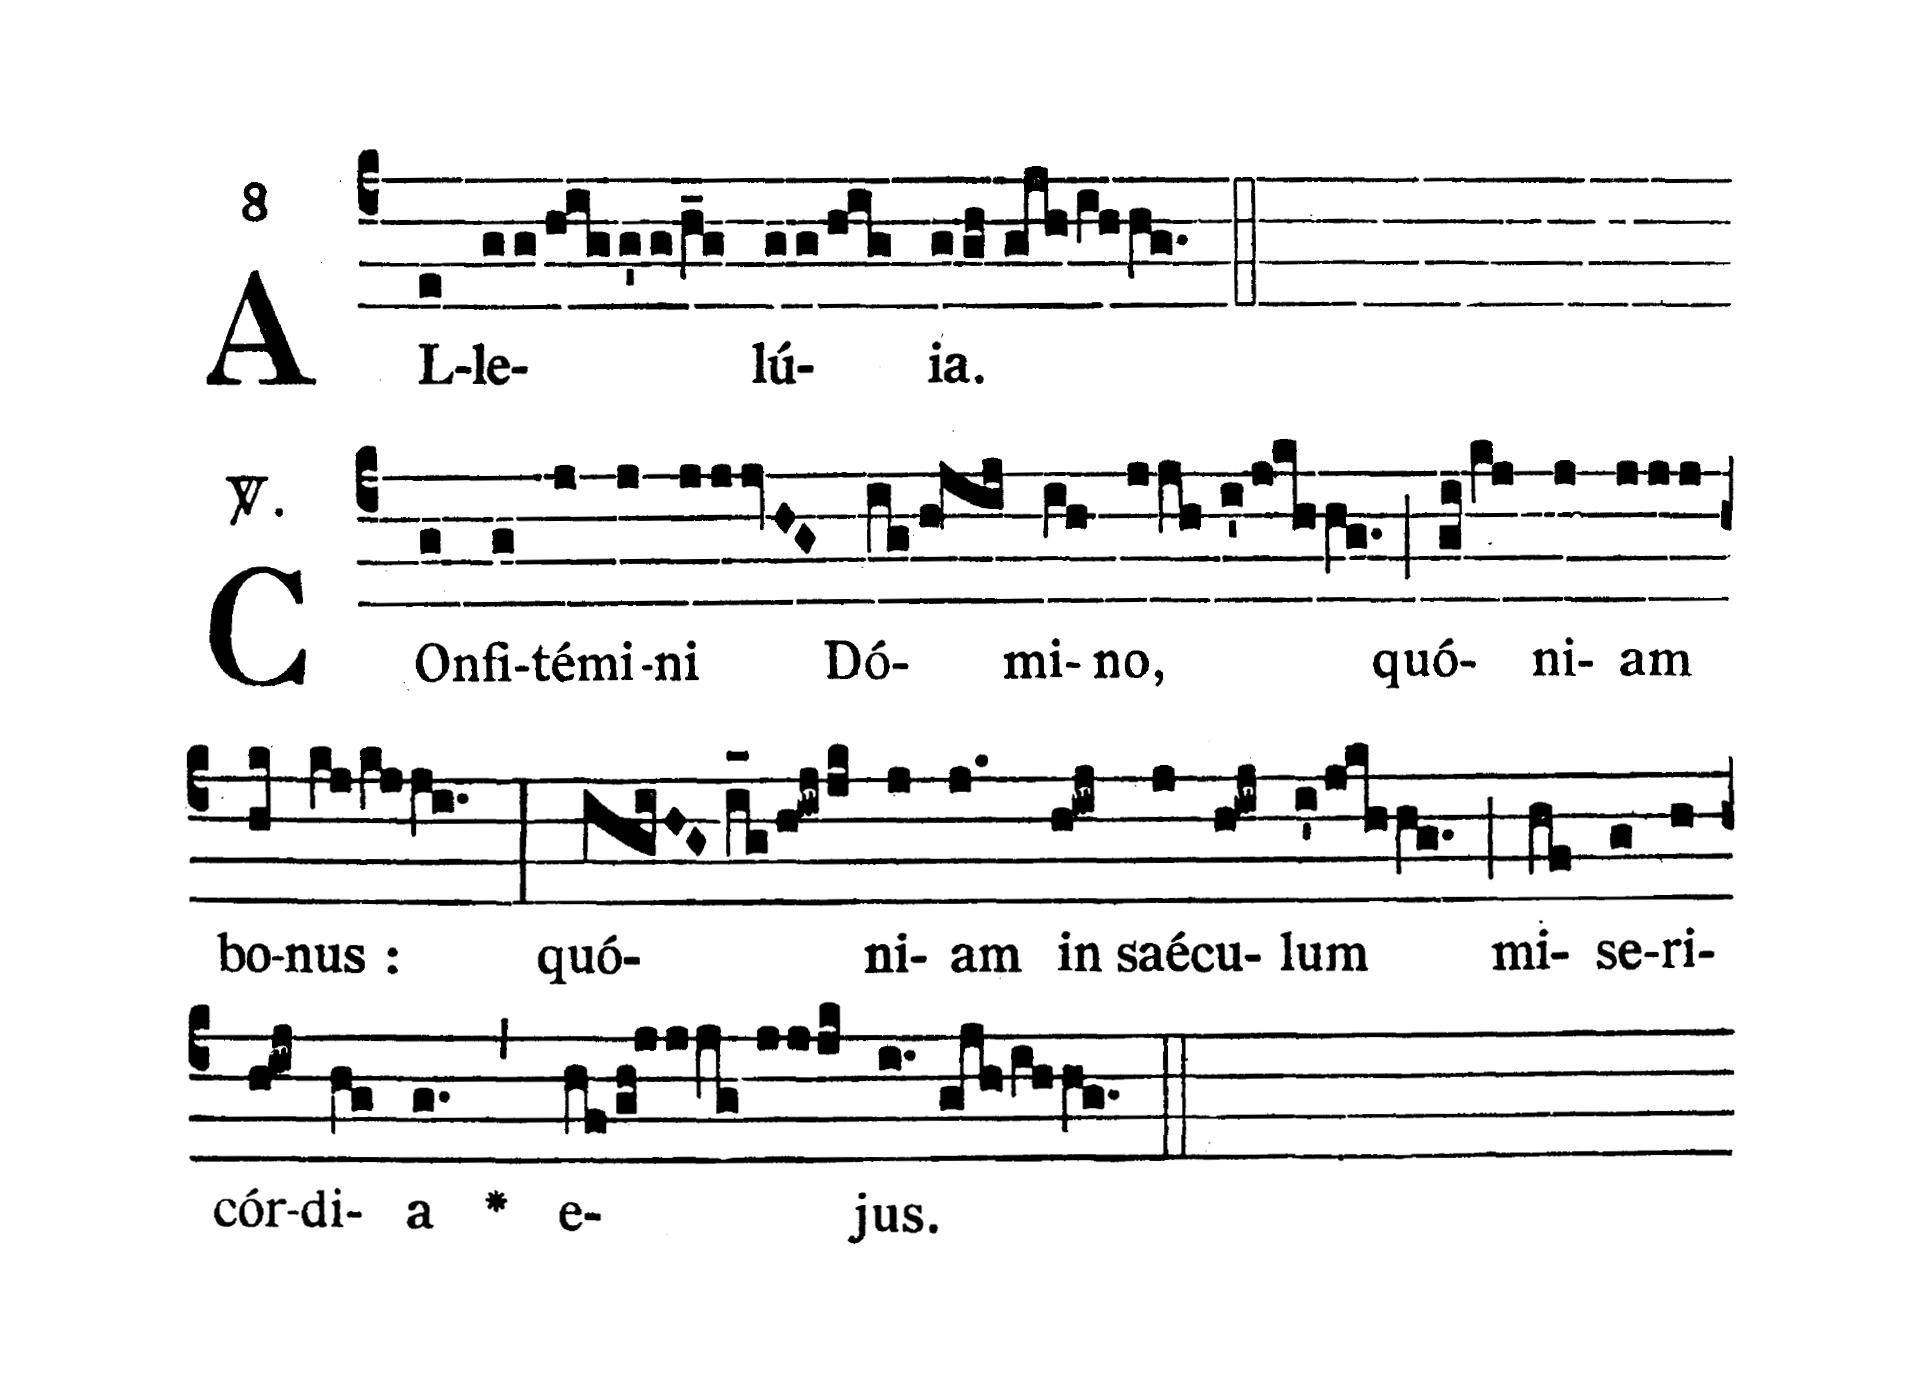 In Vigilia Pentecostes (Wigilia Zesłania Ducha Świętego) - Alleluia (Confitemini Domino)